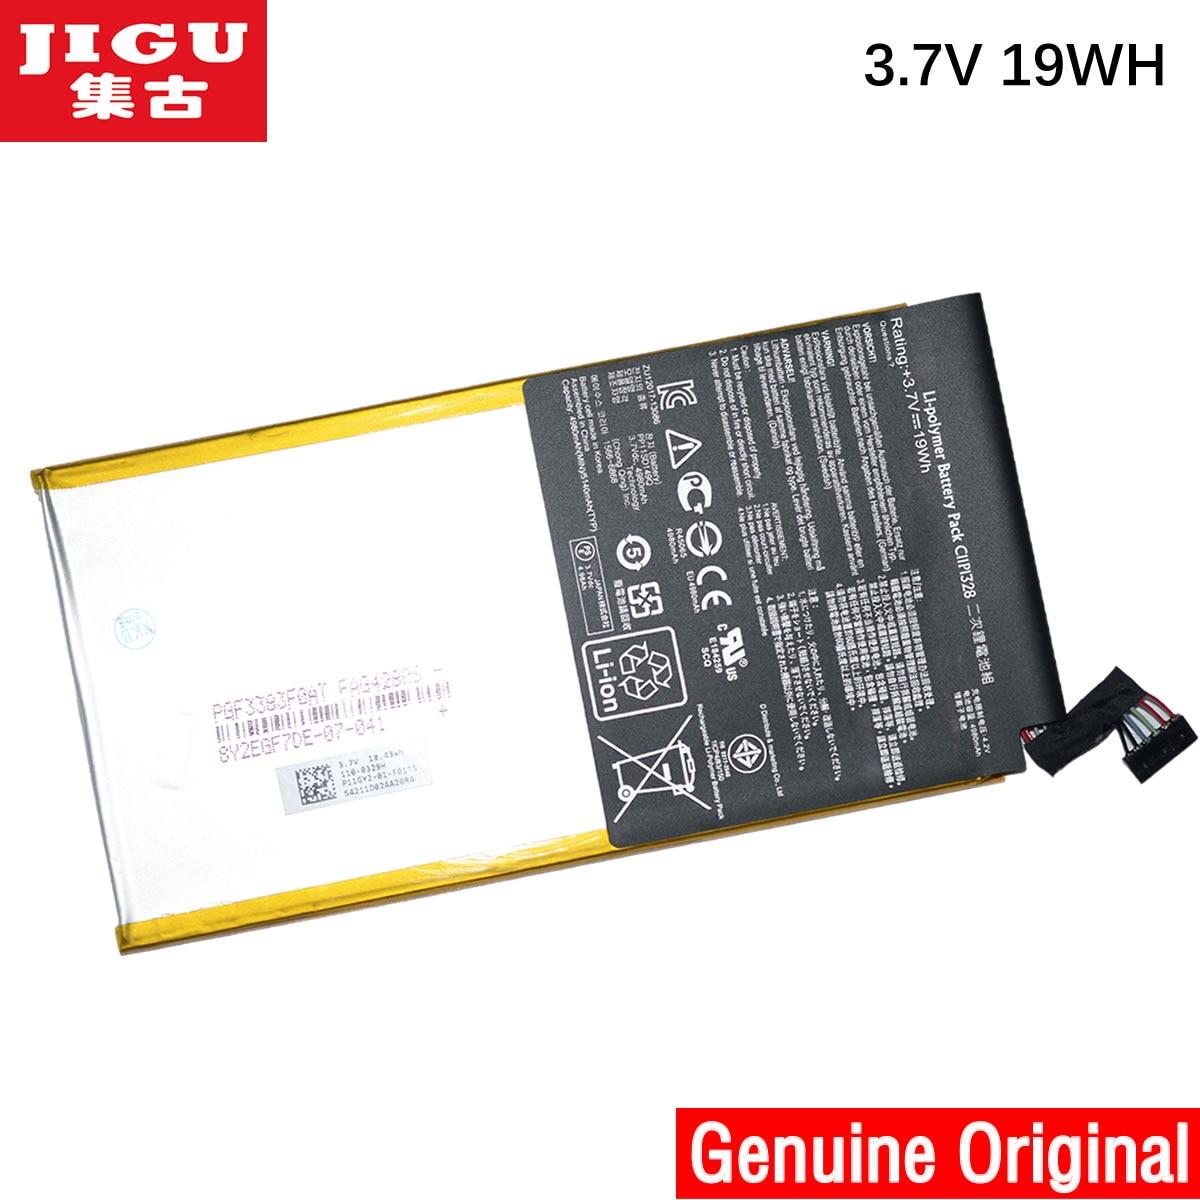 JIGU original laptop Battery C11P1328 for ASUS TF103CG TF103CX TF103C TF103CG TF103CX TF103CX-1A010A TF103CX-1B013A стоимость